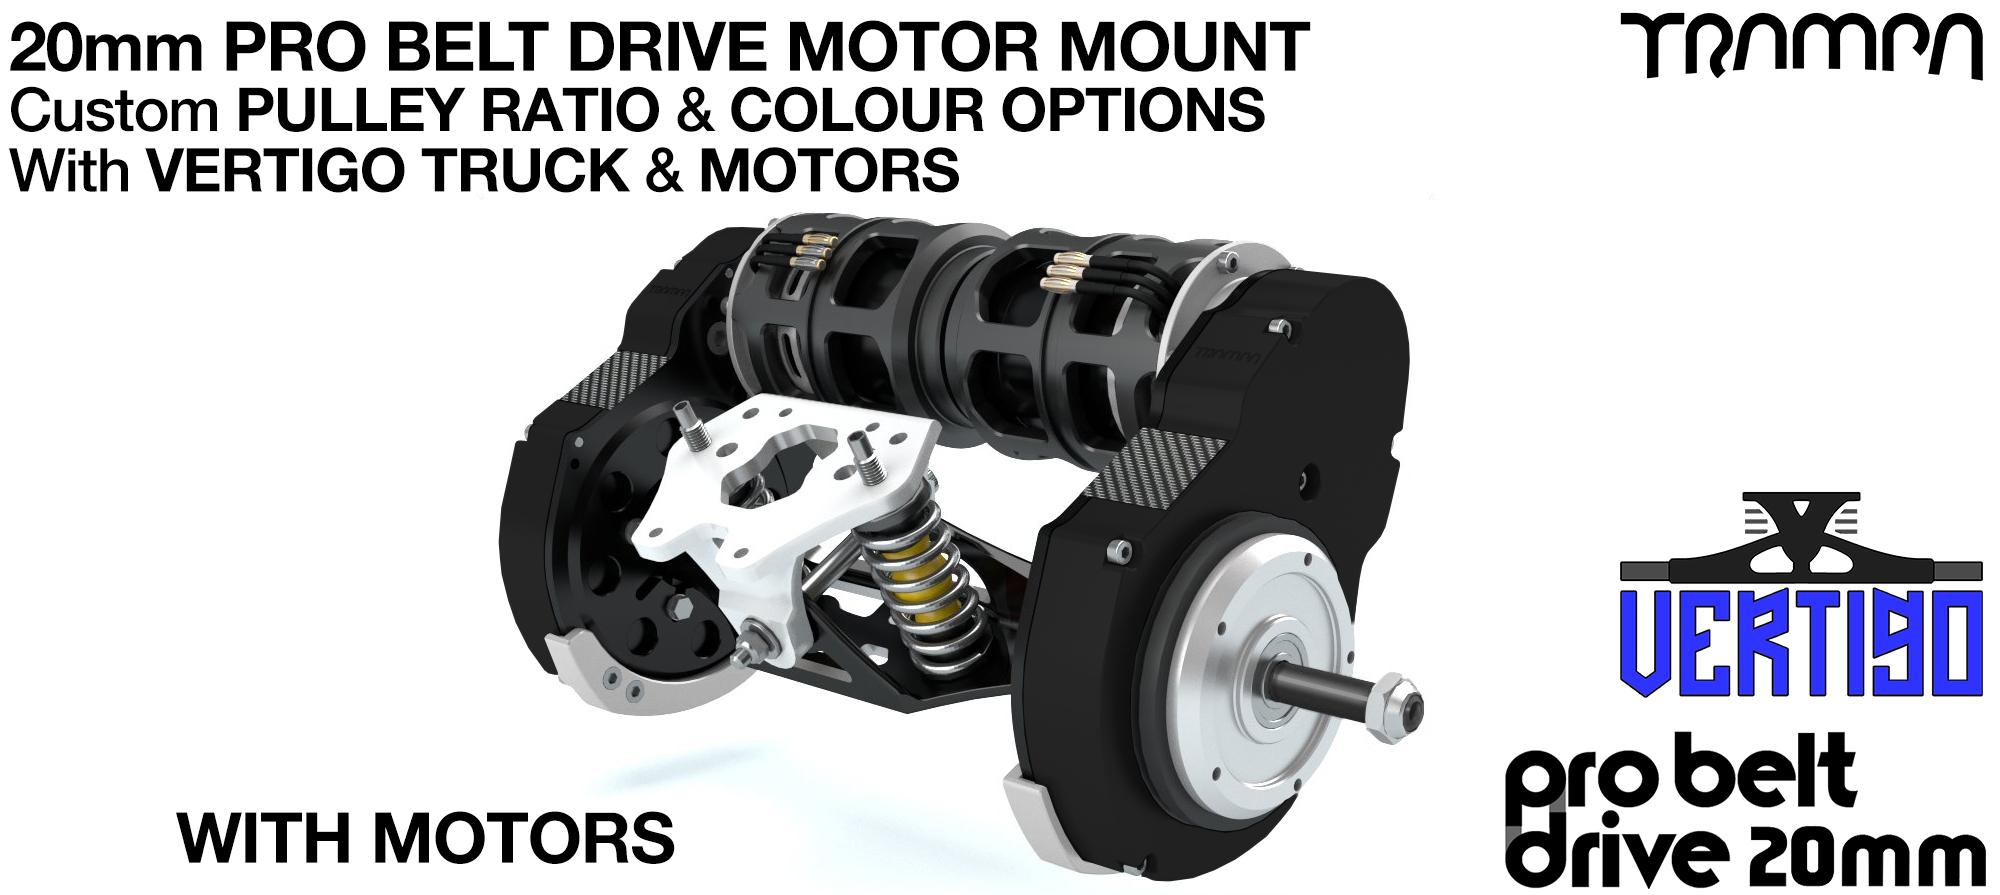 TRAMPA's 16mm  PRO Belt Drive TWIN Motor Mountainboard WITH Motors Mountred on a Precision VERTIGO Truck